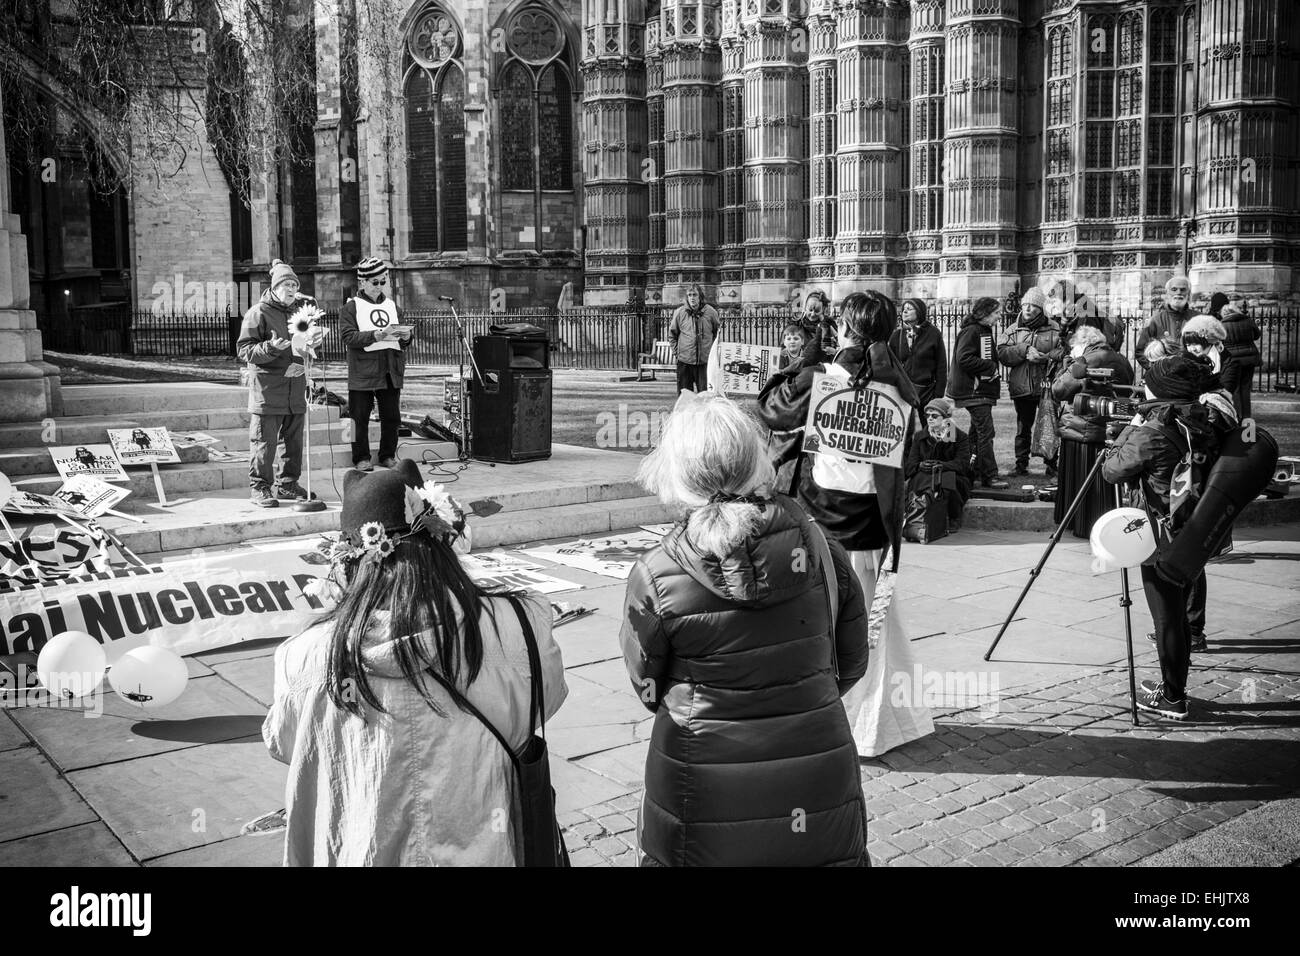 Demonstration, Old Palace Yard, London - Stock Image